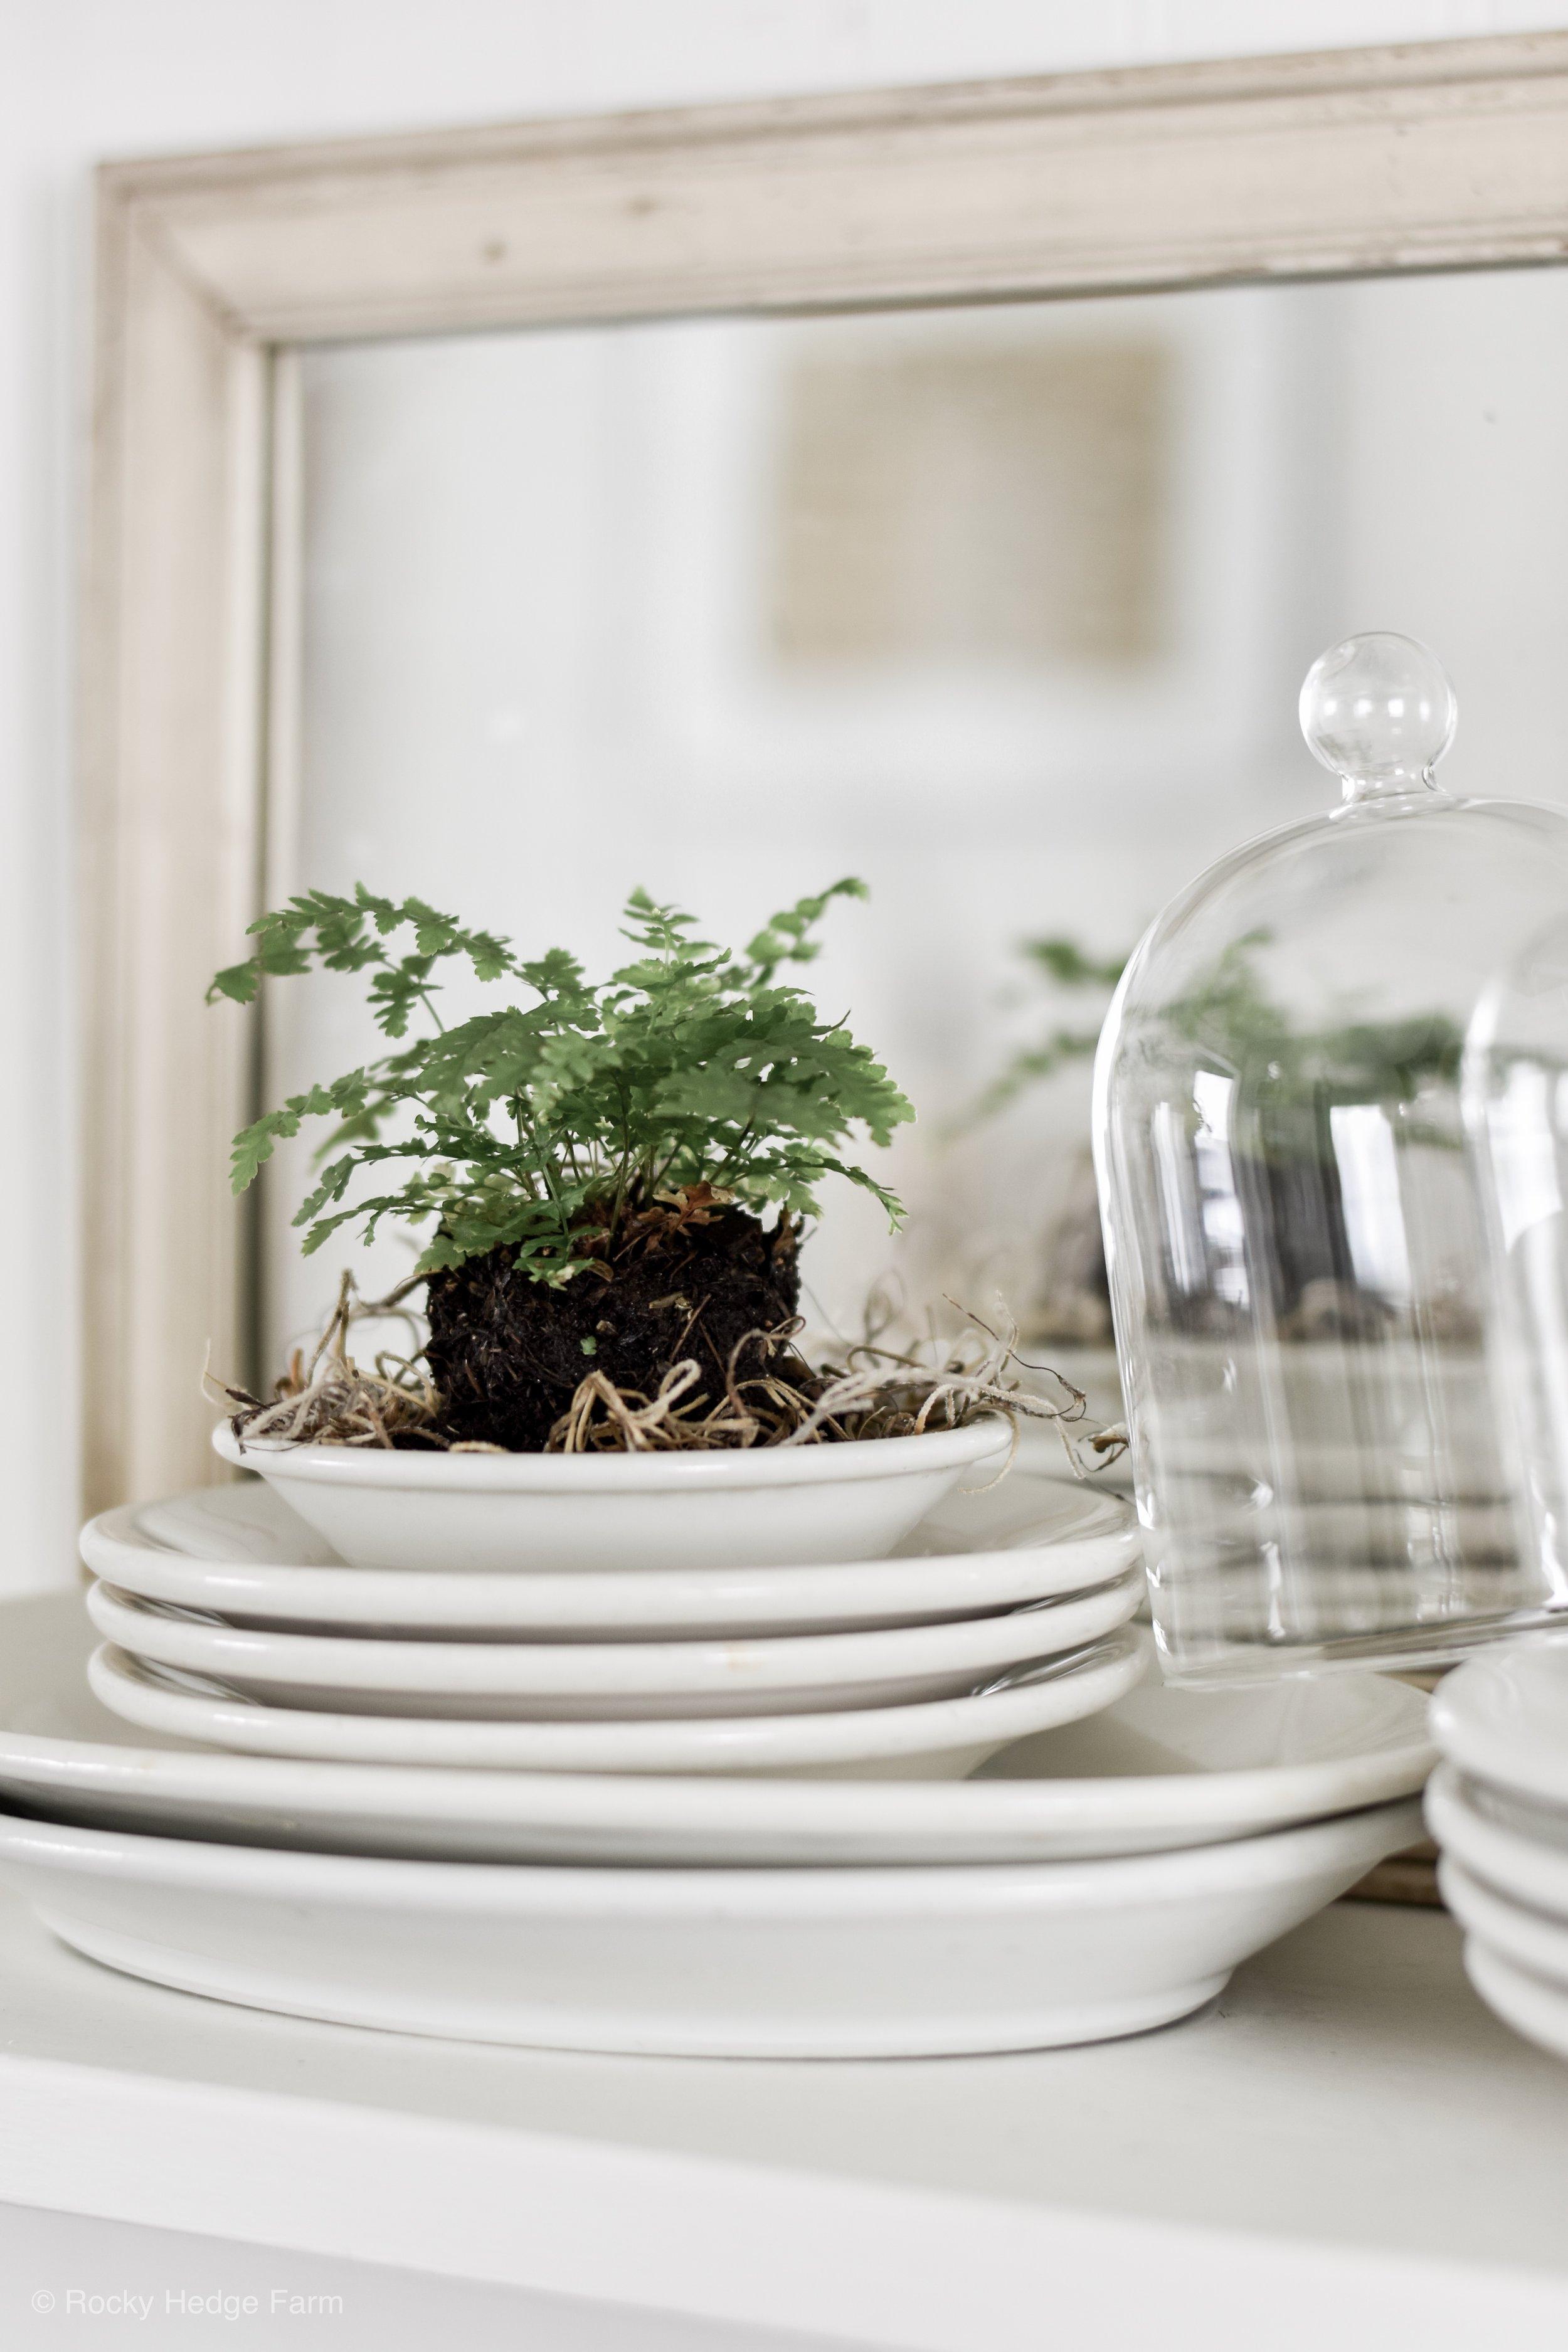 Growing Ferns Under Glass - Bell Jar Cloche | Rocky Hedge Farm